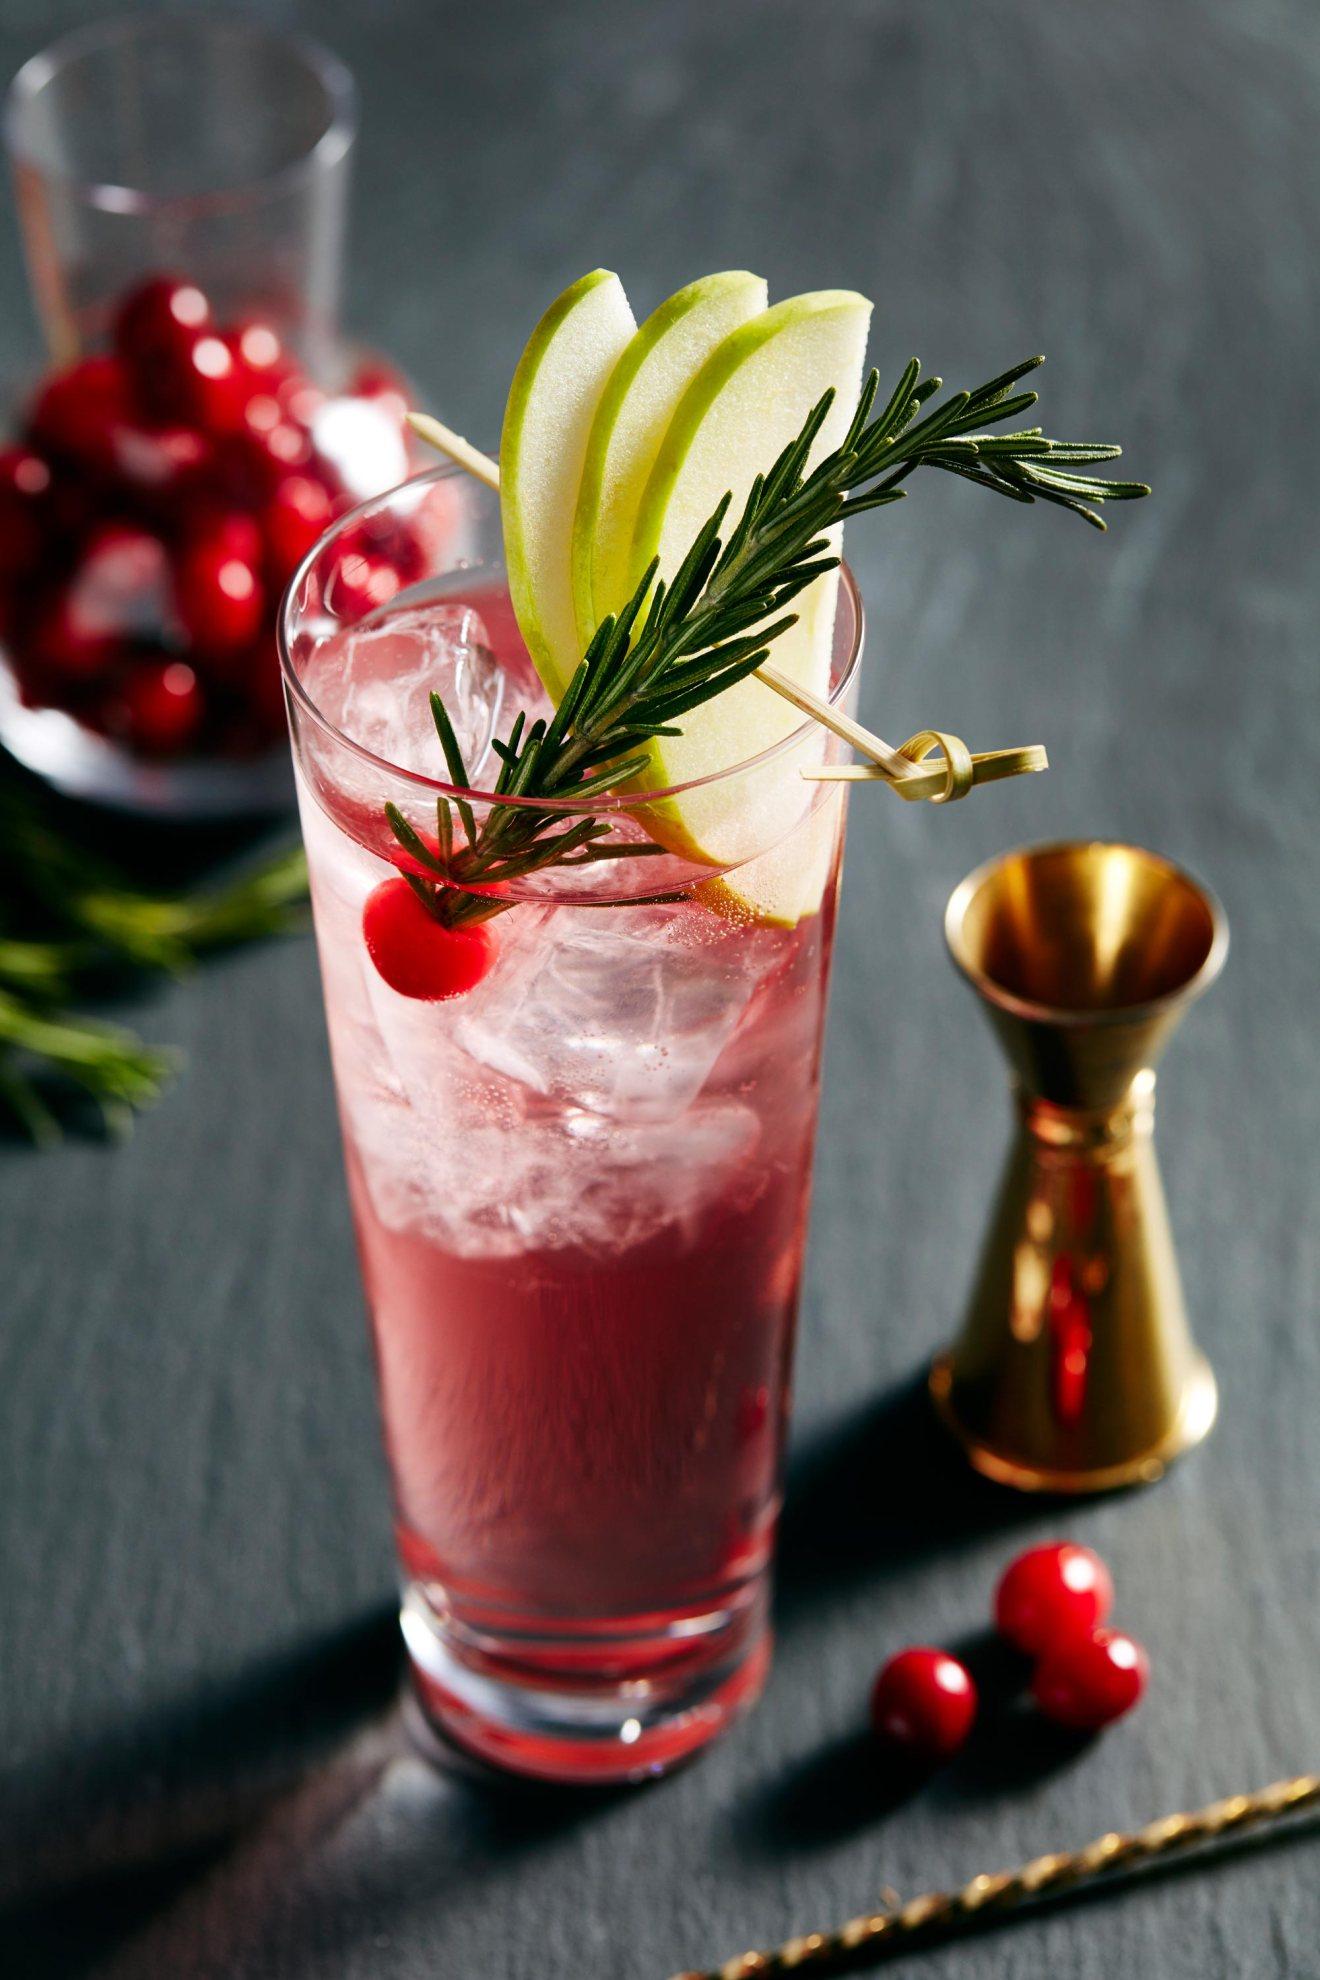 Drink, Food, Non-alcoholic beverage, Cocktail garnish, Juice, Alcoholic beverage, Ingredient, Shrub, Cranberry, Cocktail,